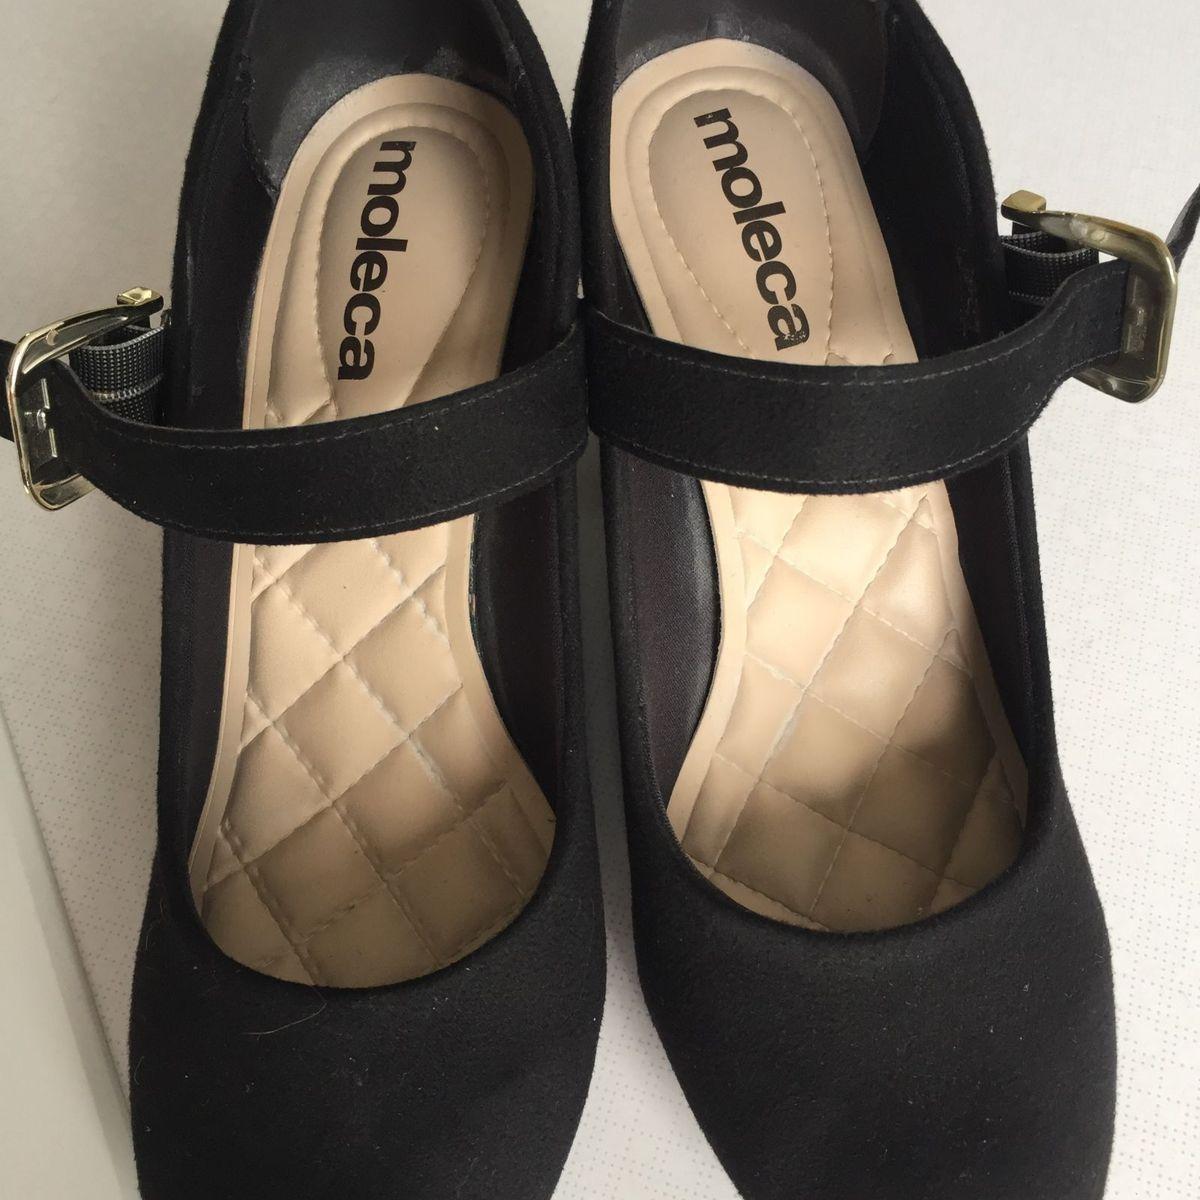 7c0a4915c Sapato Boneca Moleca | Sapato Feminino Moleca Usado 31223207 | enjoei